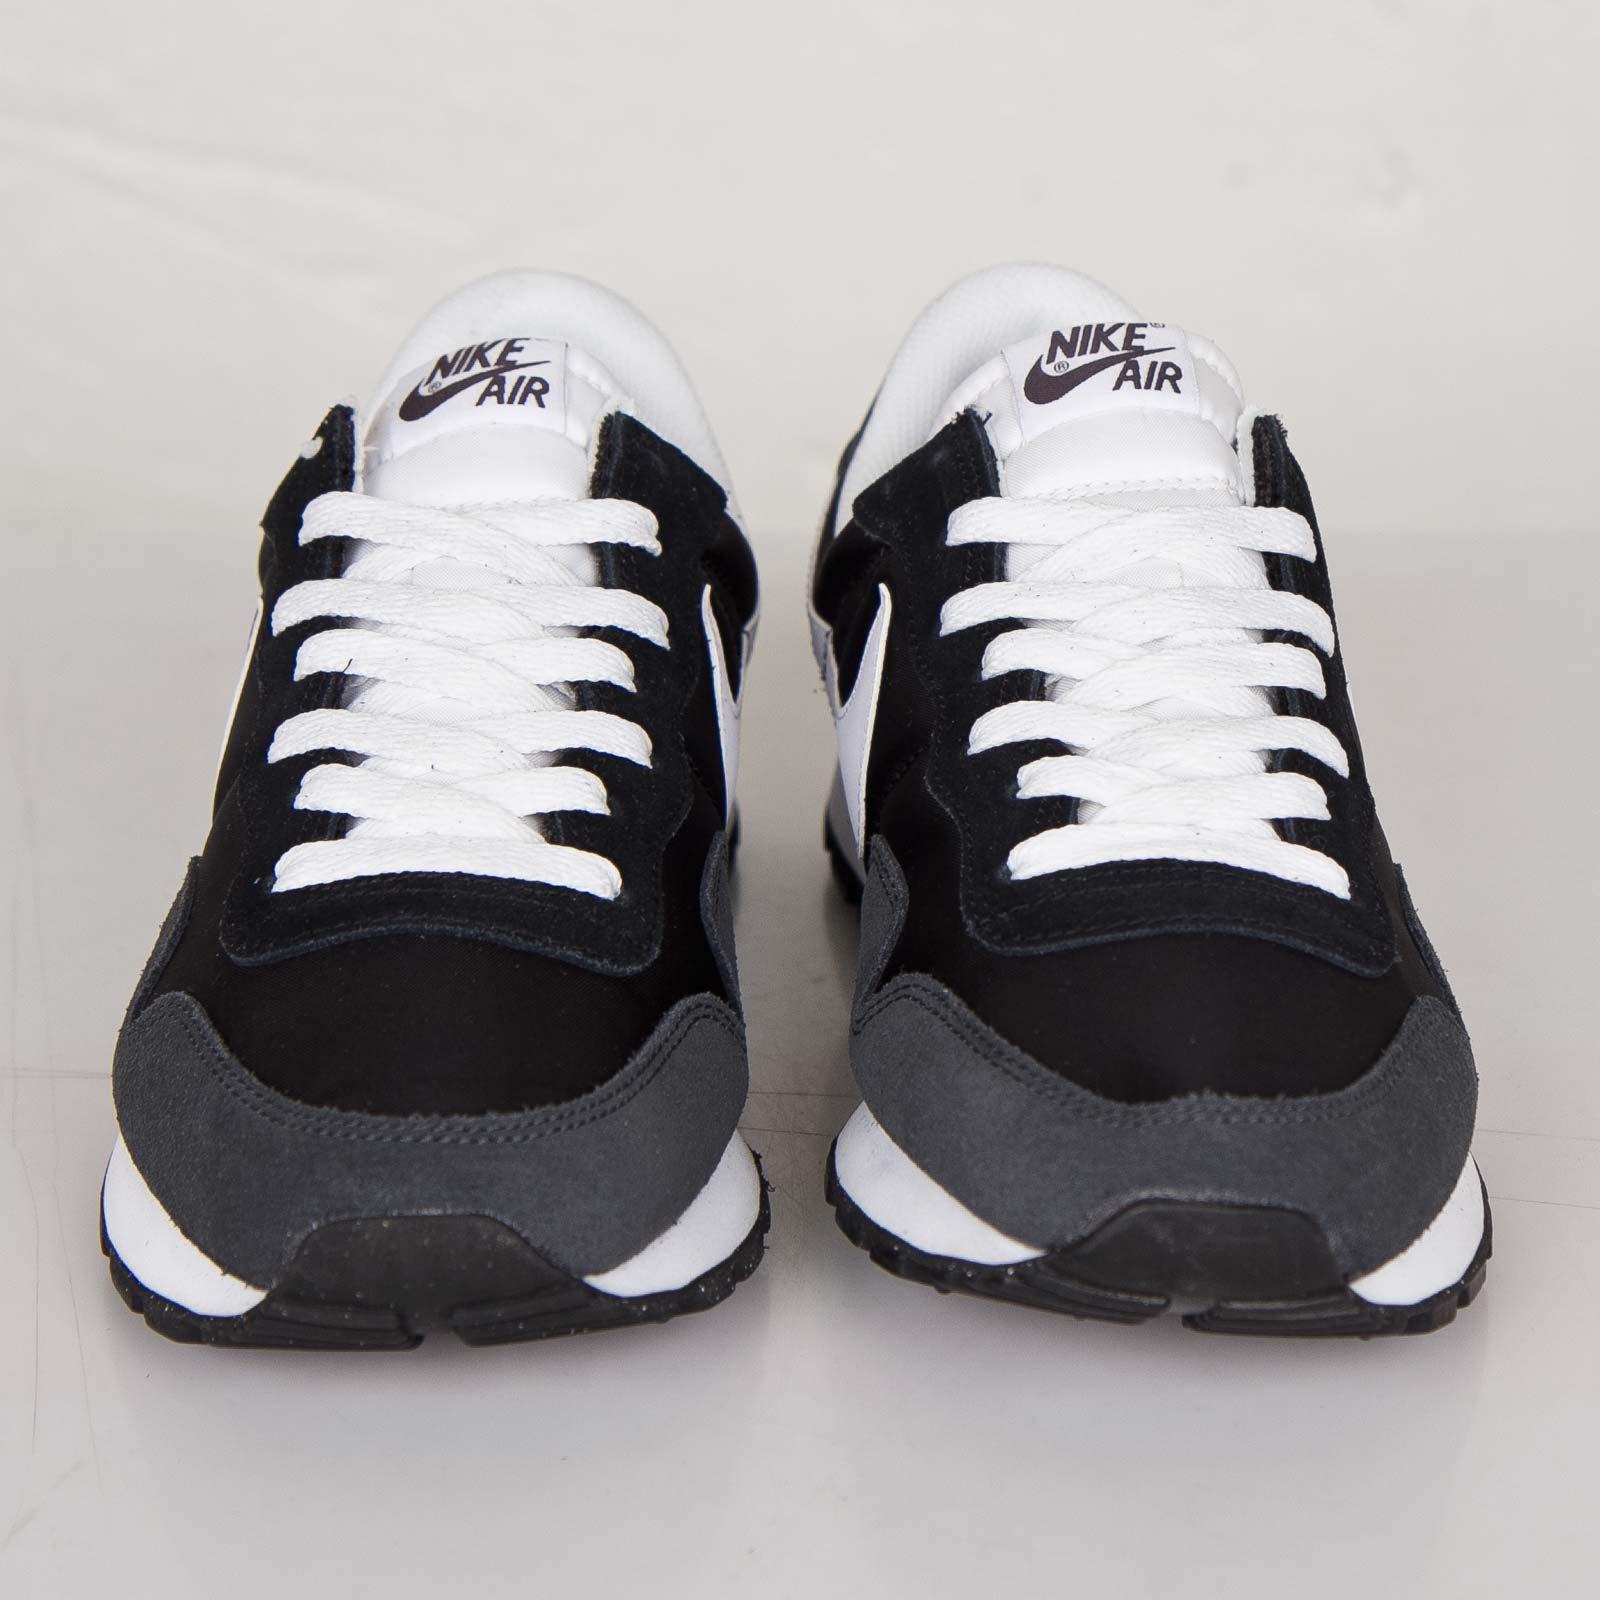 bd0376a648a Nike Air Pegasus 83 - 599124-010 - Sneakersnstuff